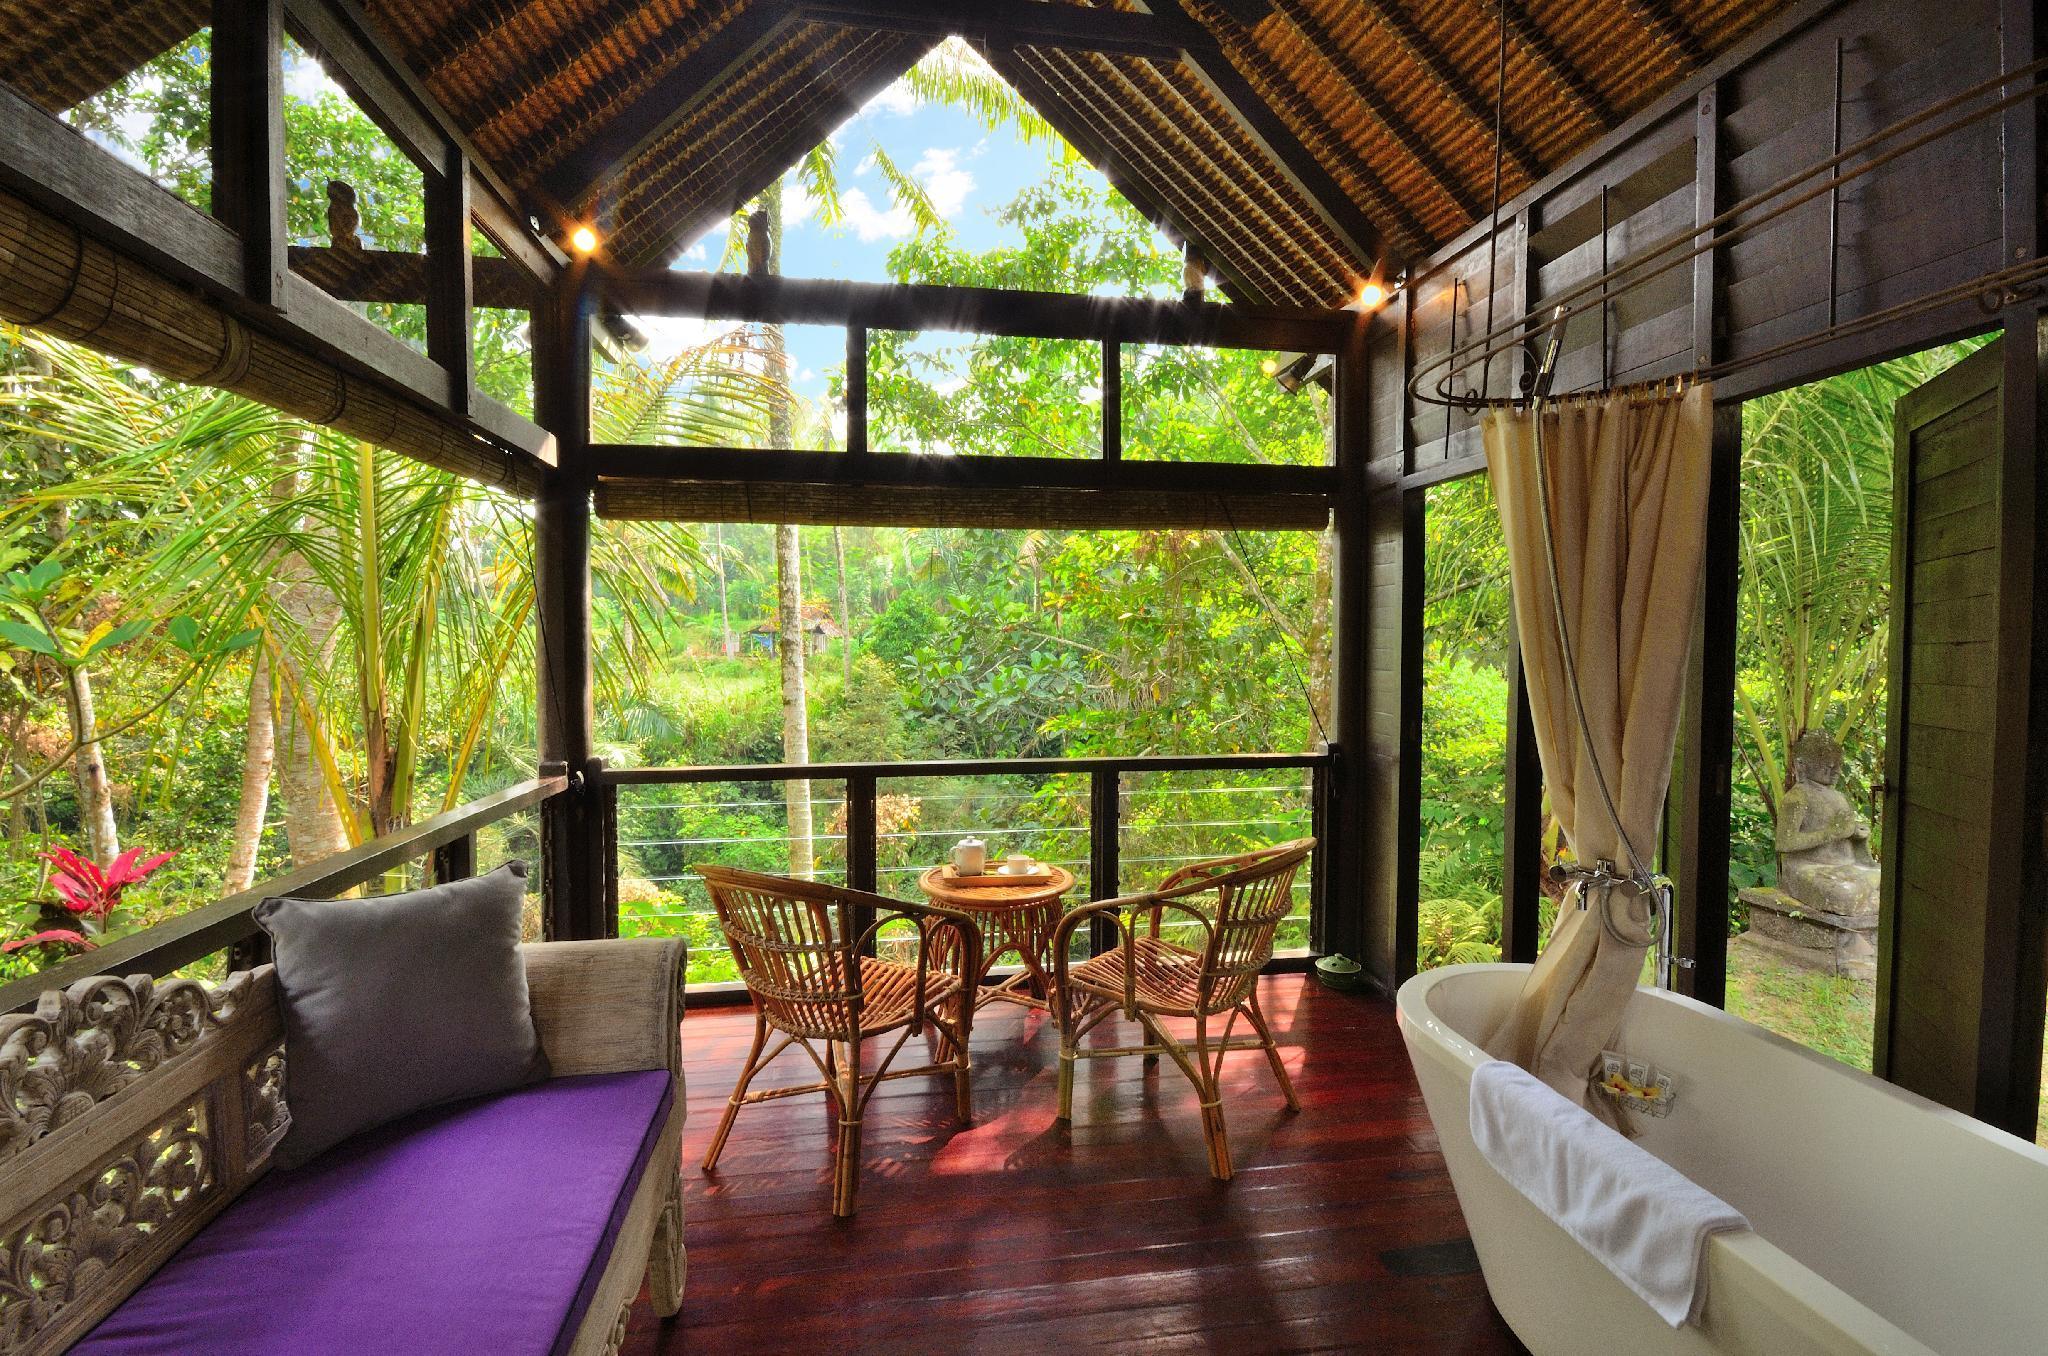 Price Romantic 1BR Honeymoon Unique Villa Near Ubud